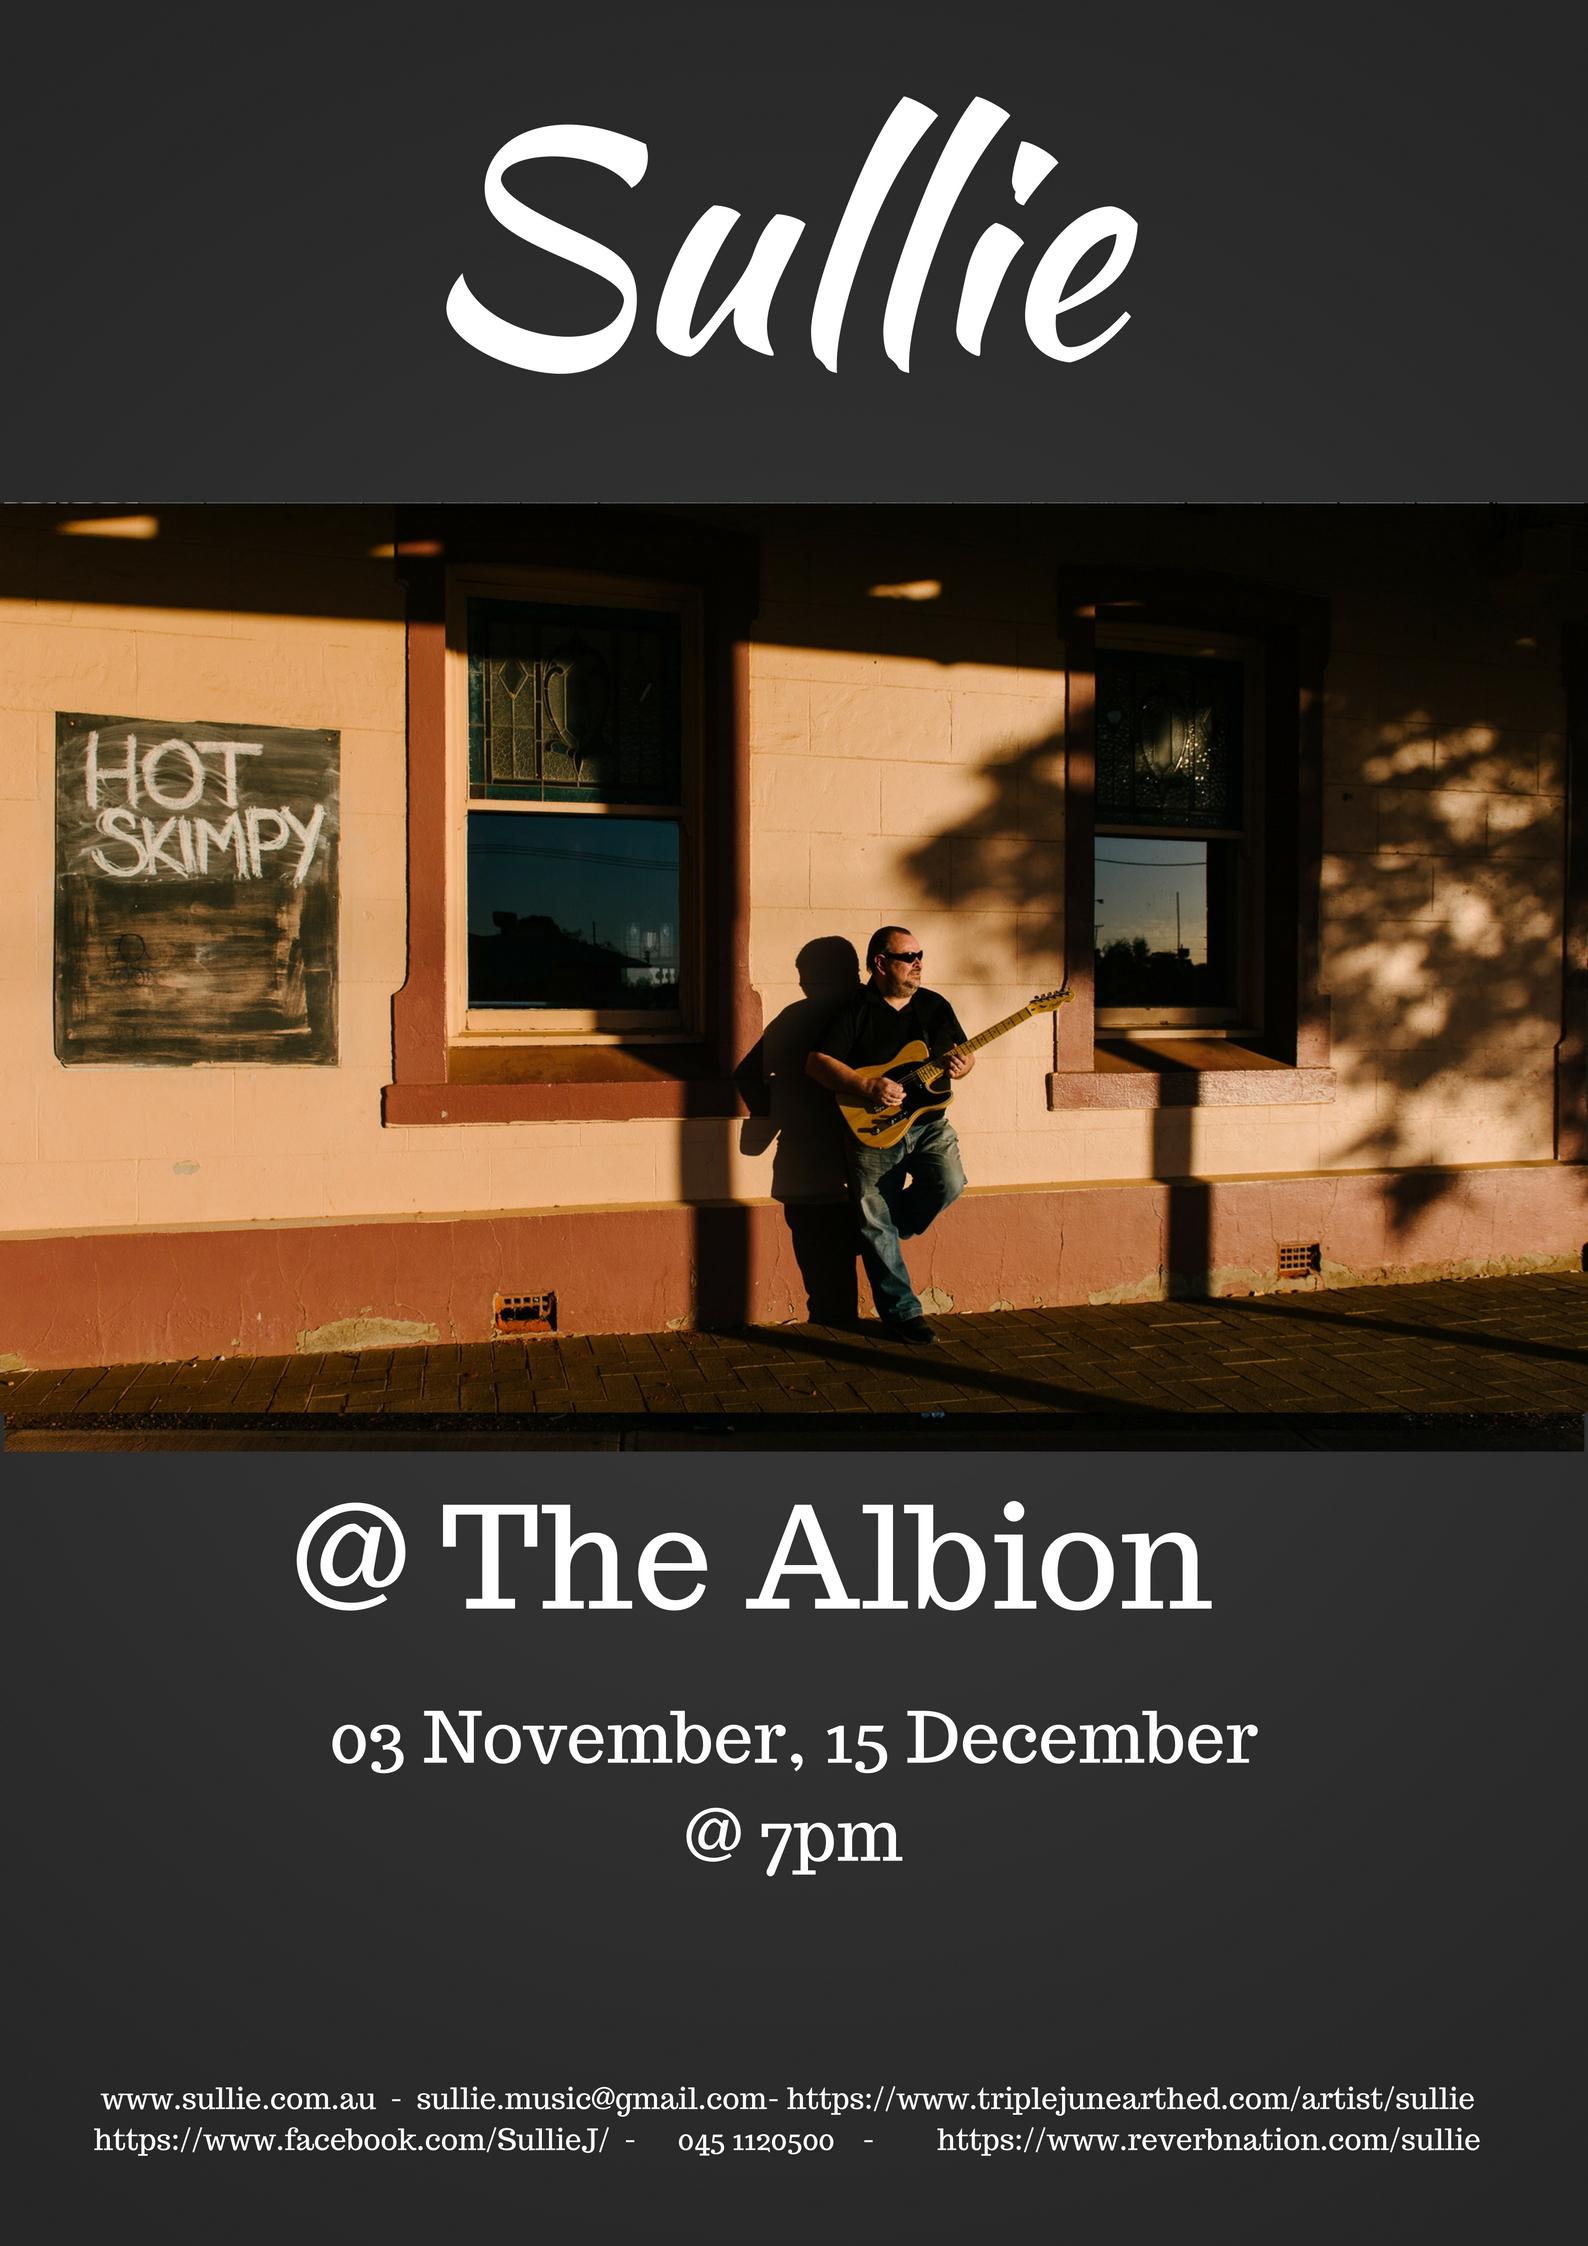 Sullie-Albion poster